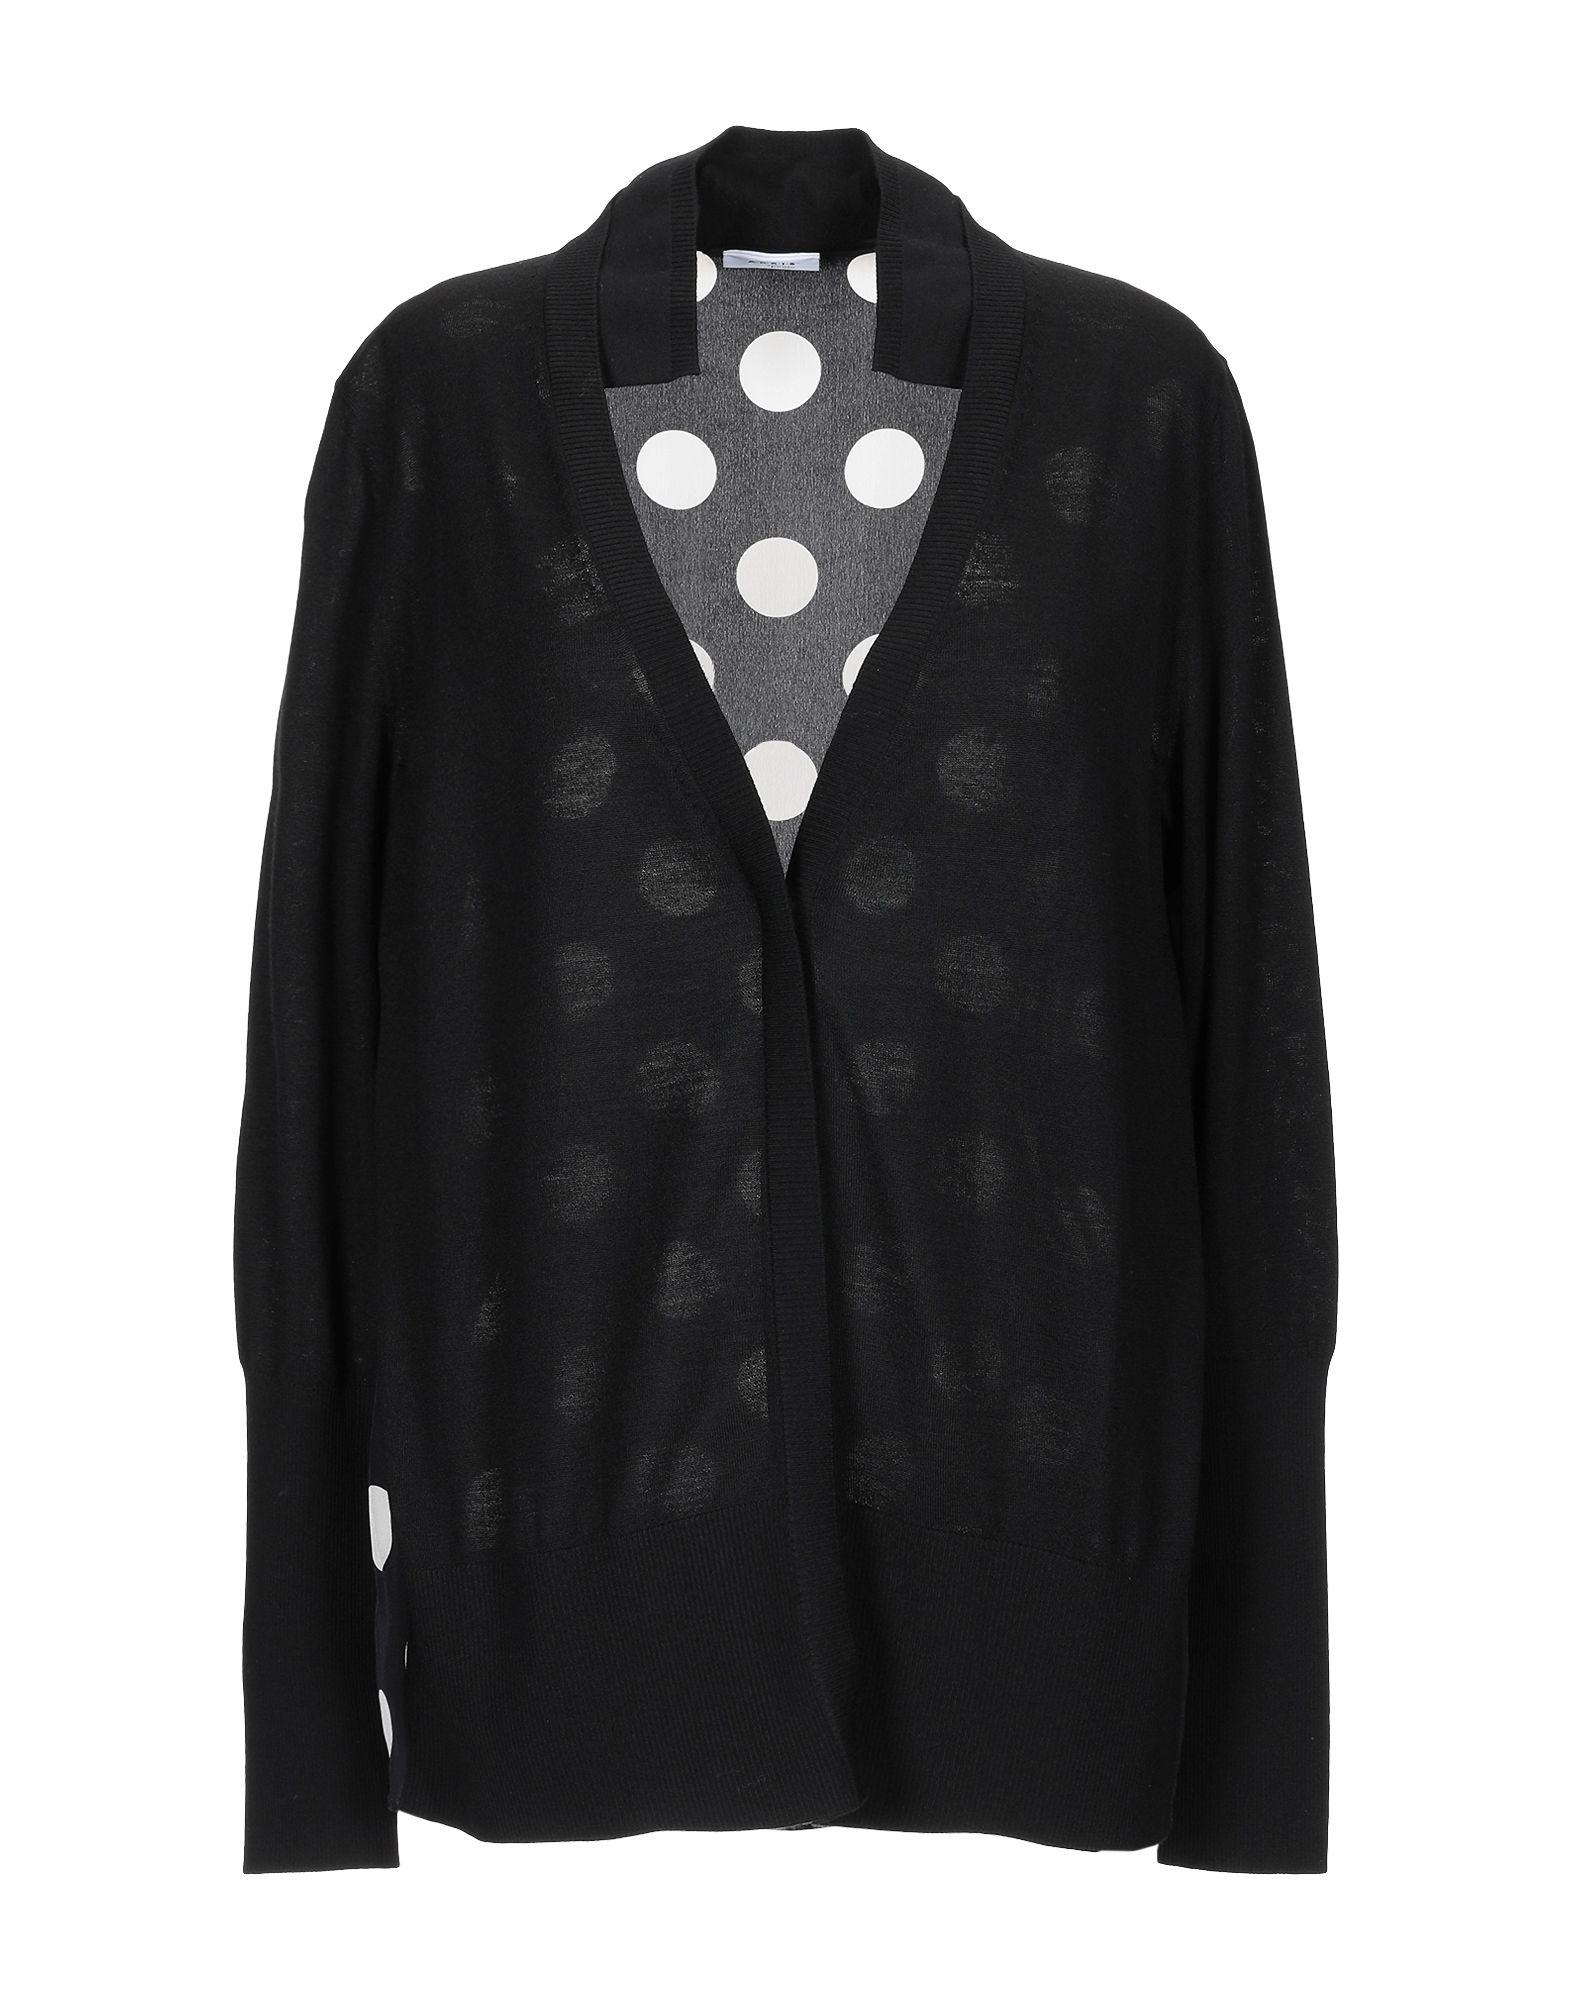 AKRIS PUNTO Кардиган мужской кардиган sweater new camisola dos o chaqueta punto men sweaters s36